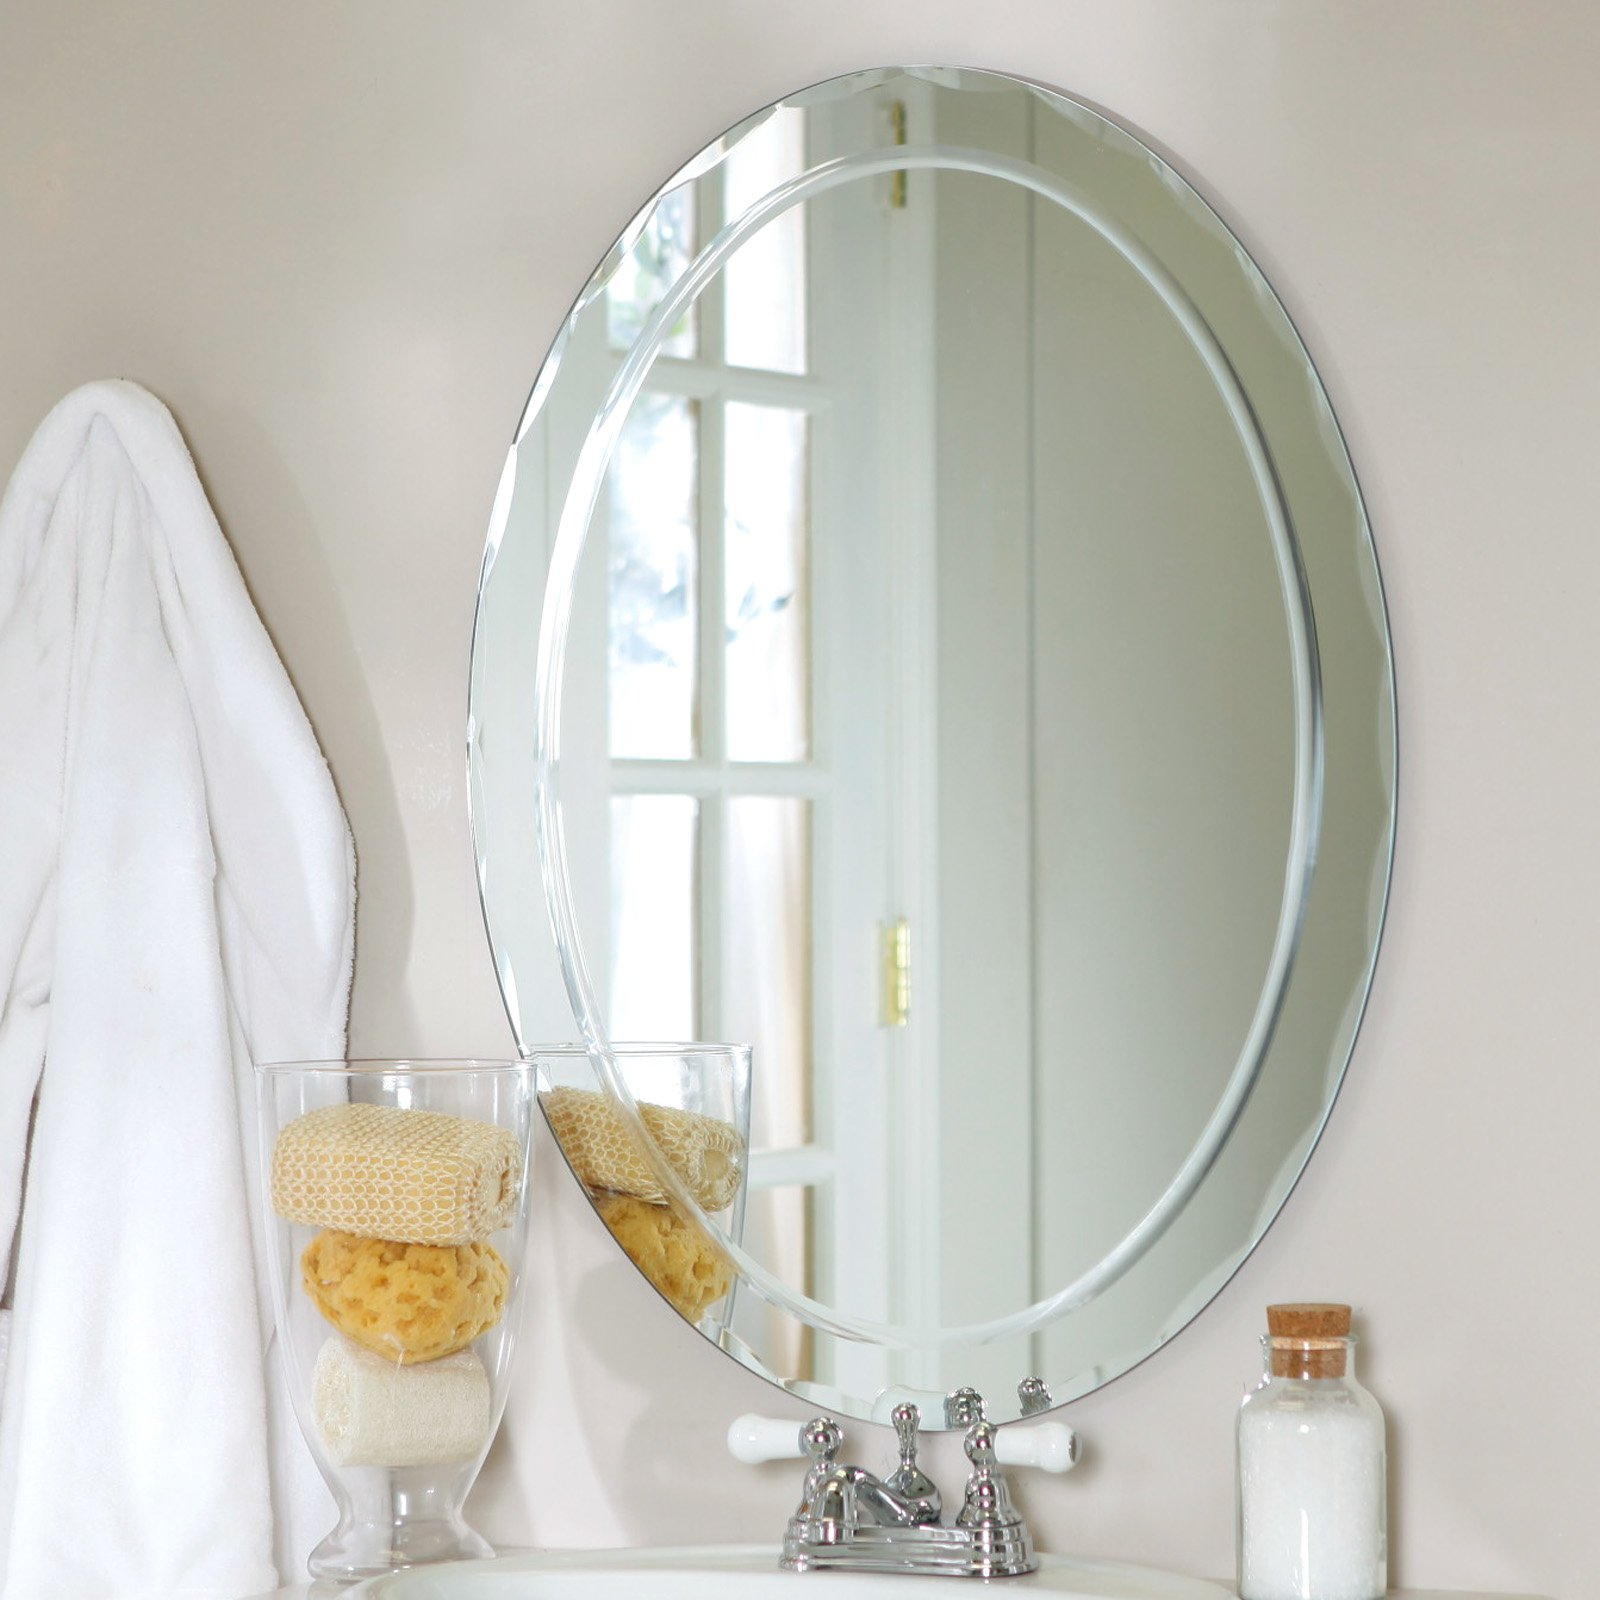 Décor Wonderland Frameless Aldo Wall Mirror - 23.5W x 31.5H in ...